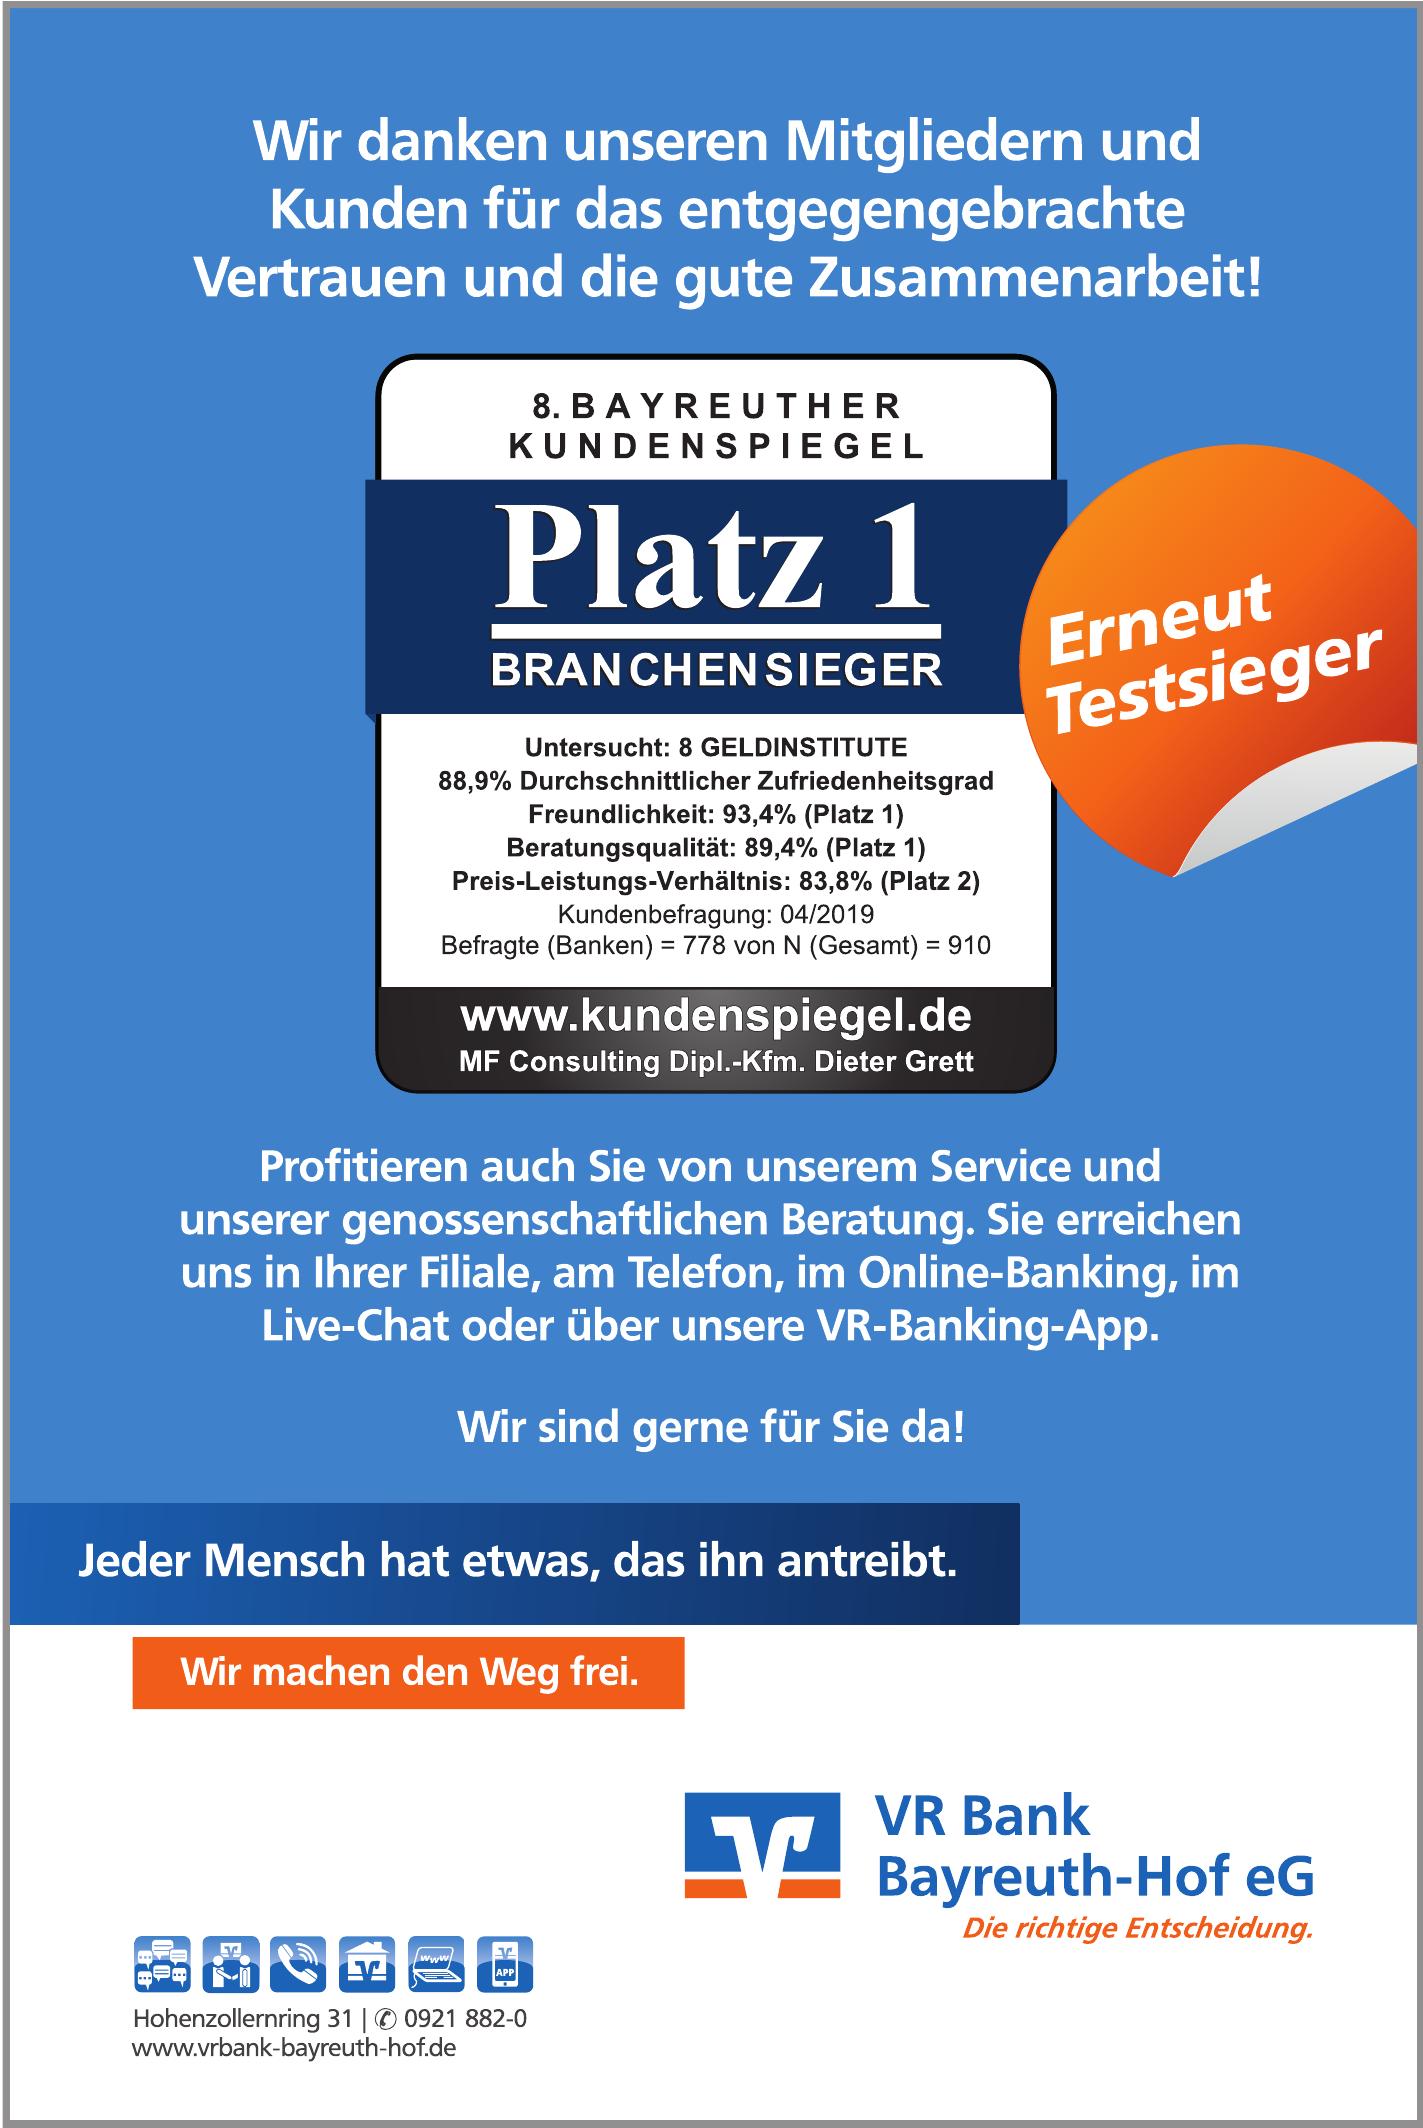 VR Bank Bayreuth-Hof eG